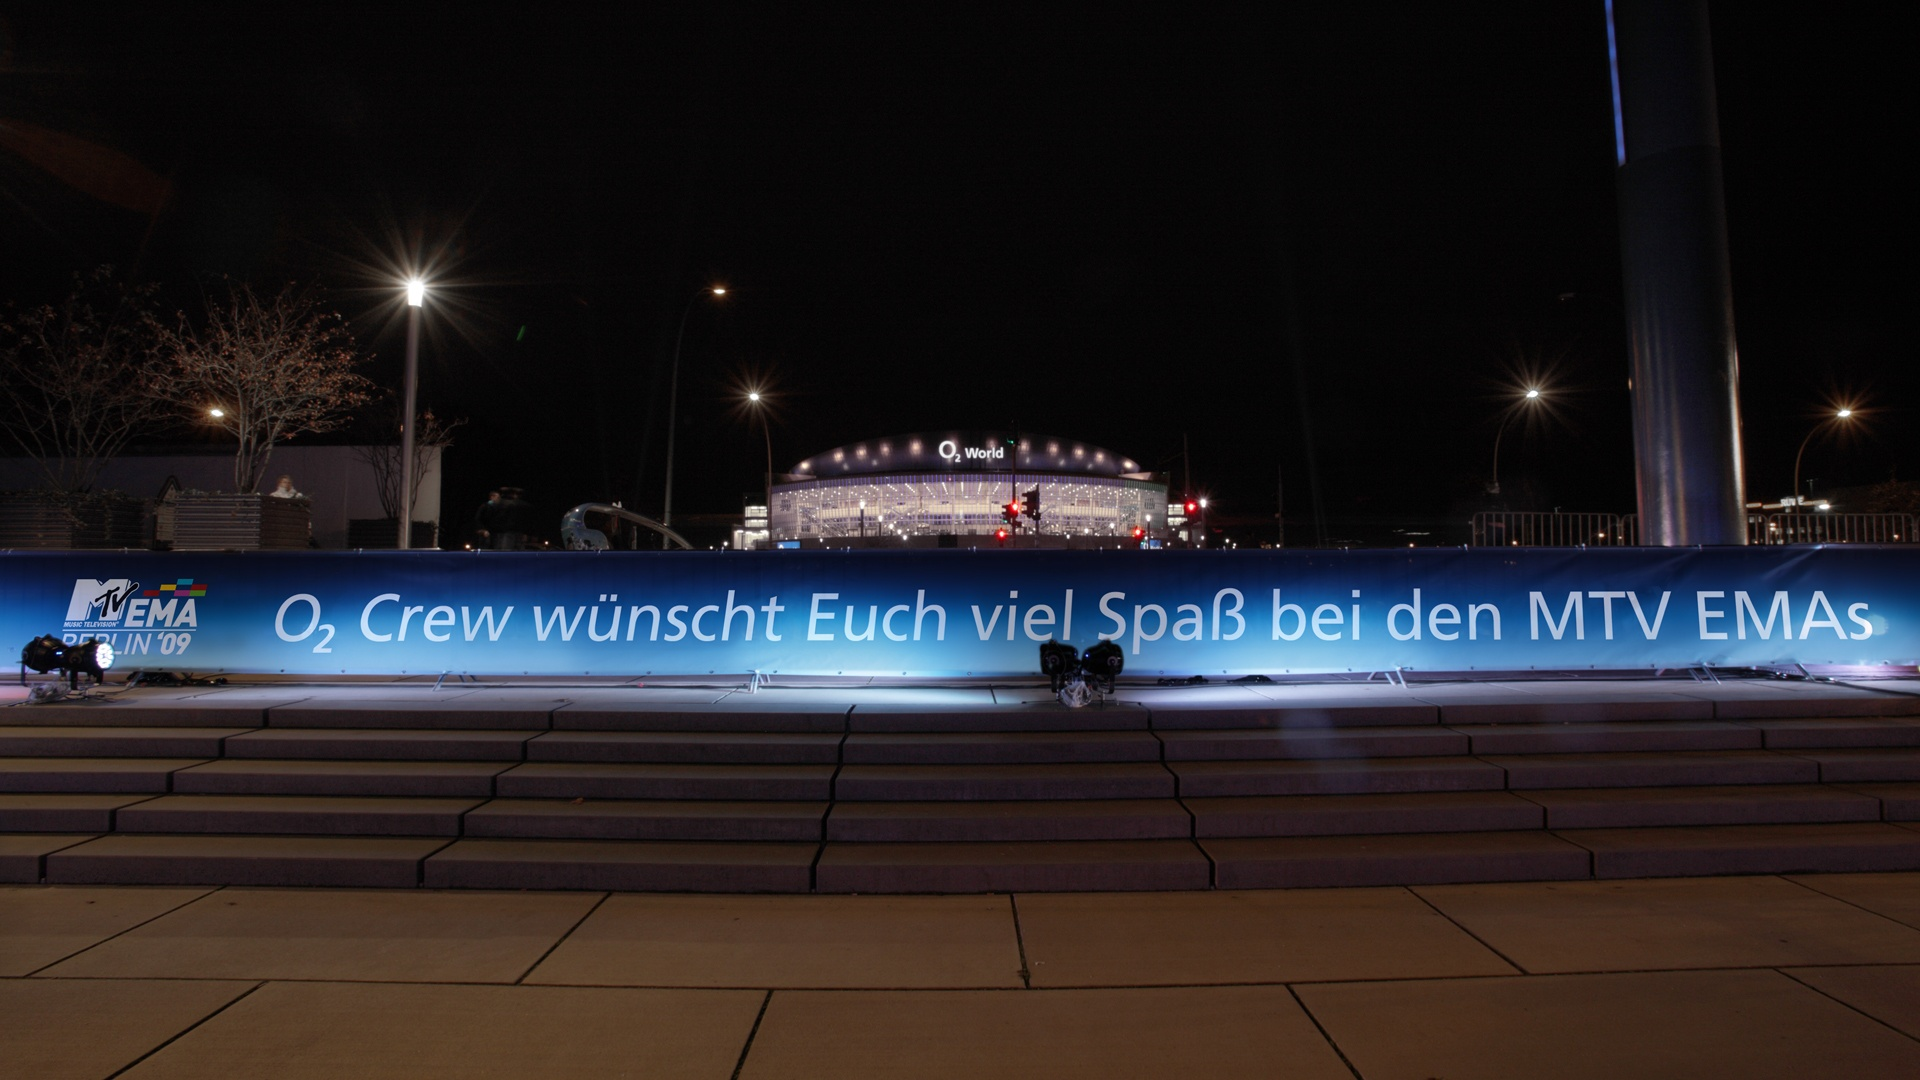 360° Kampagne MTV Sponsoring Event o2 World Berlin